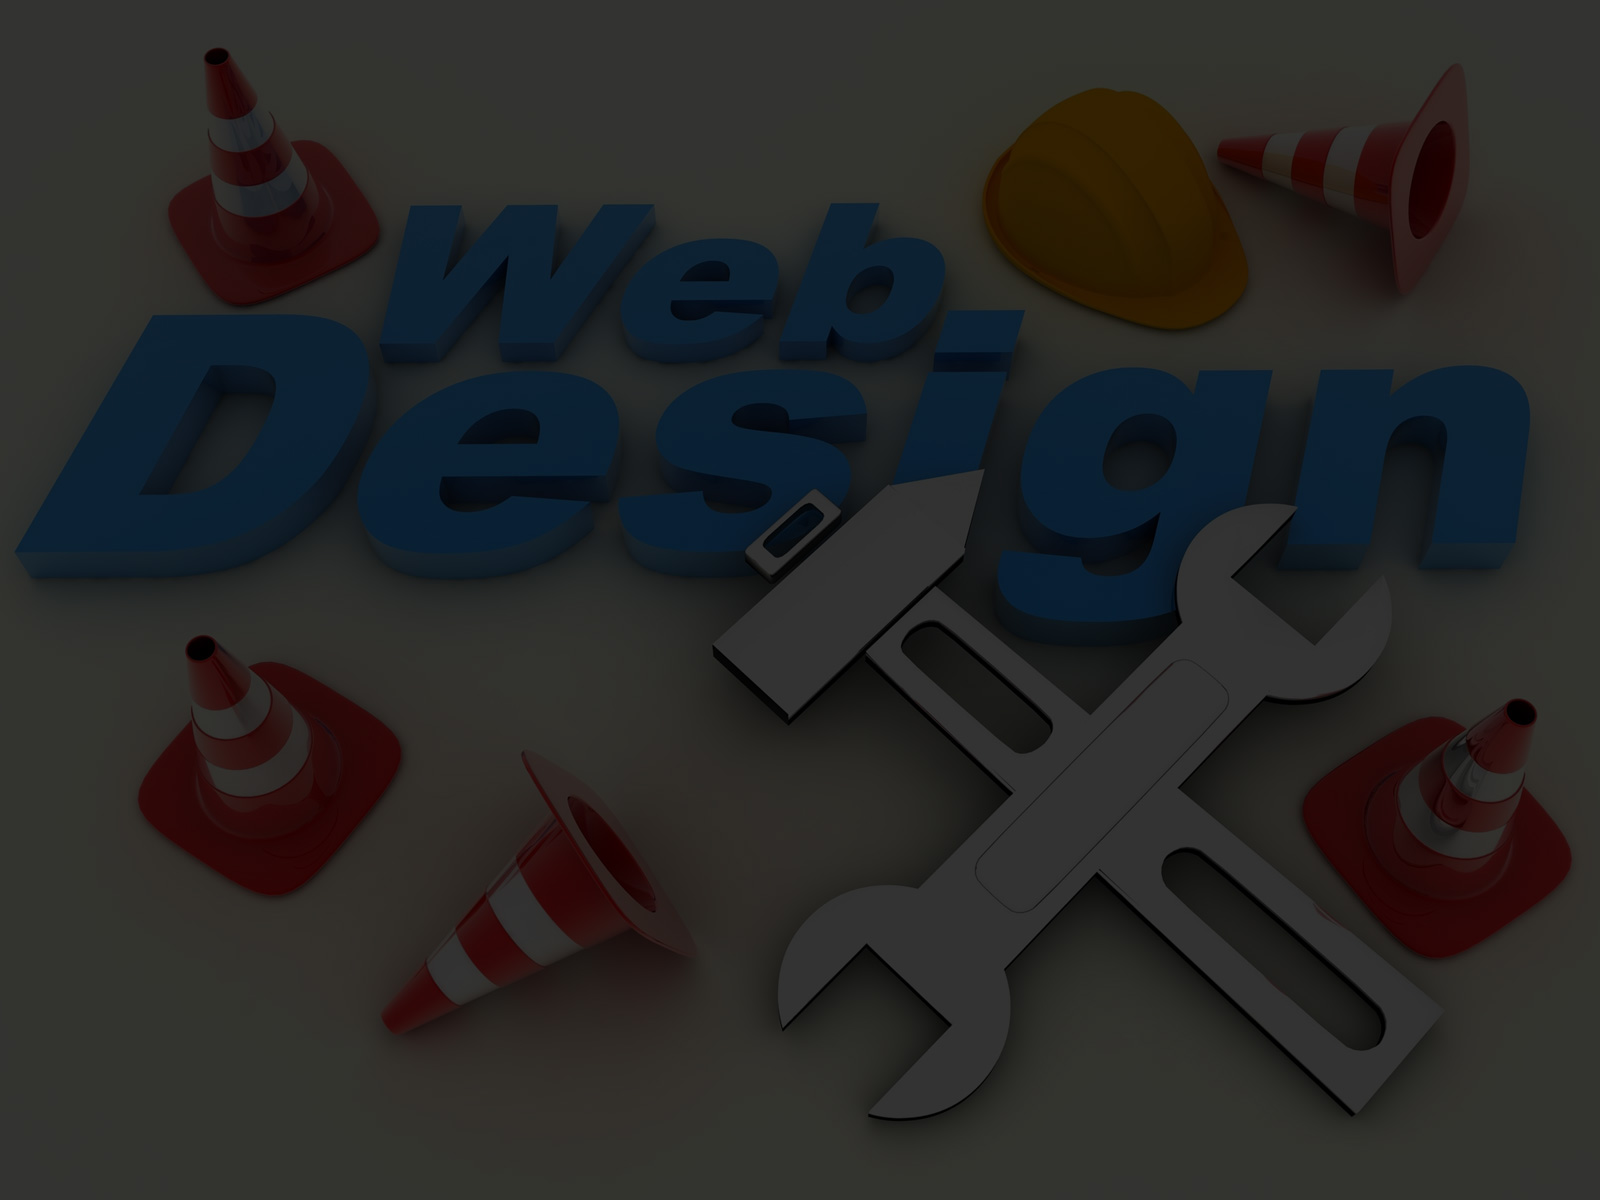 Top 5 Home Builder Website Design Tips